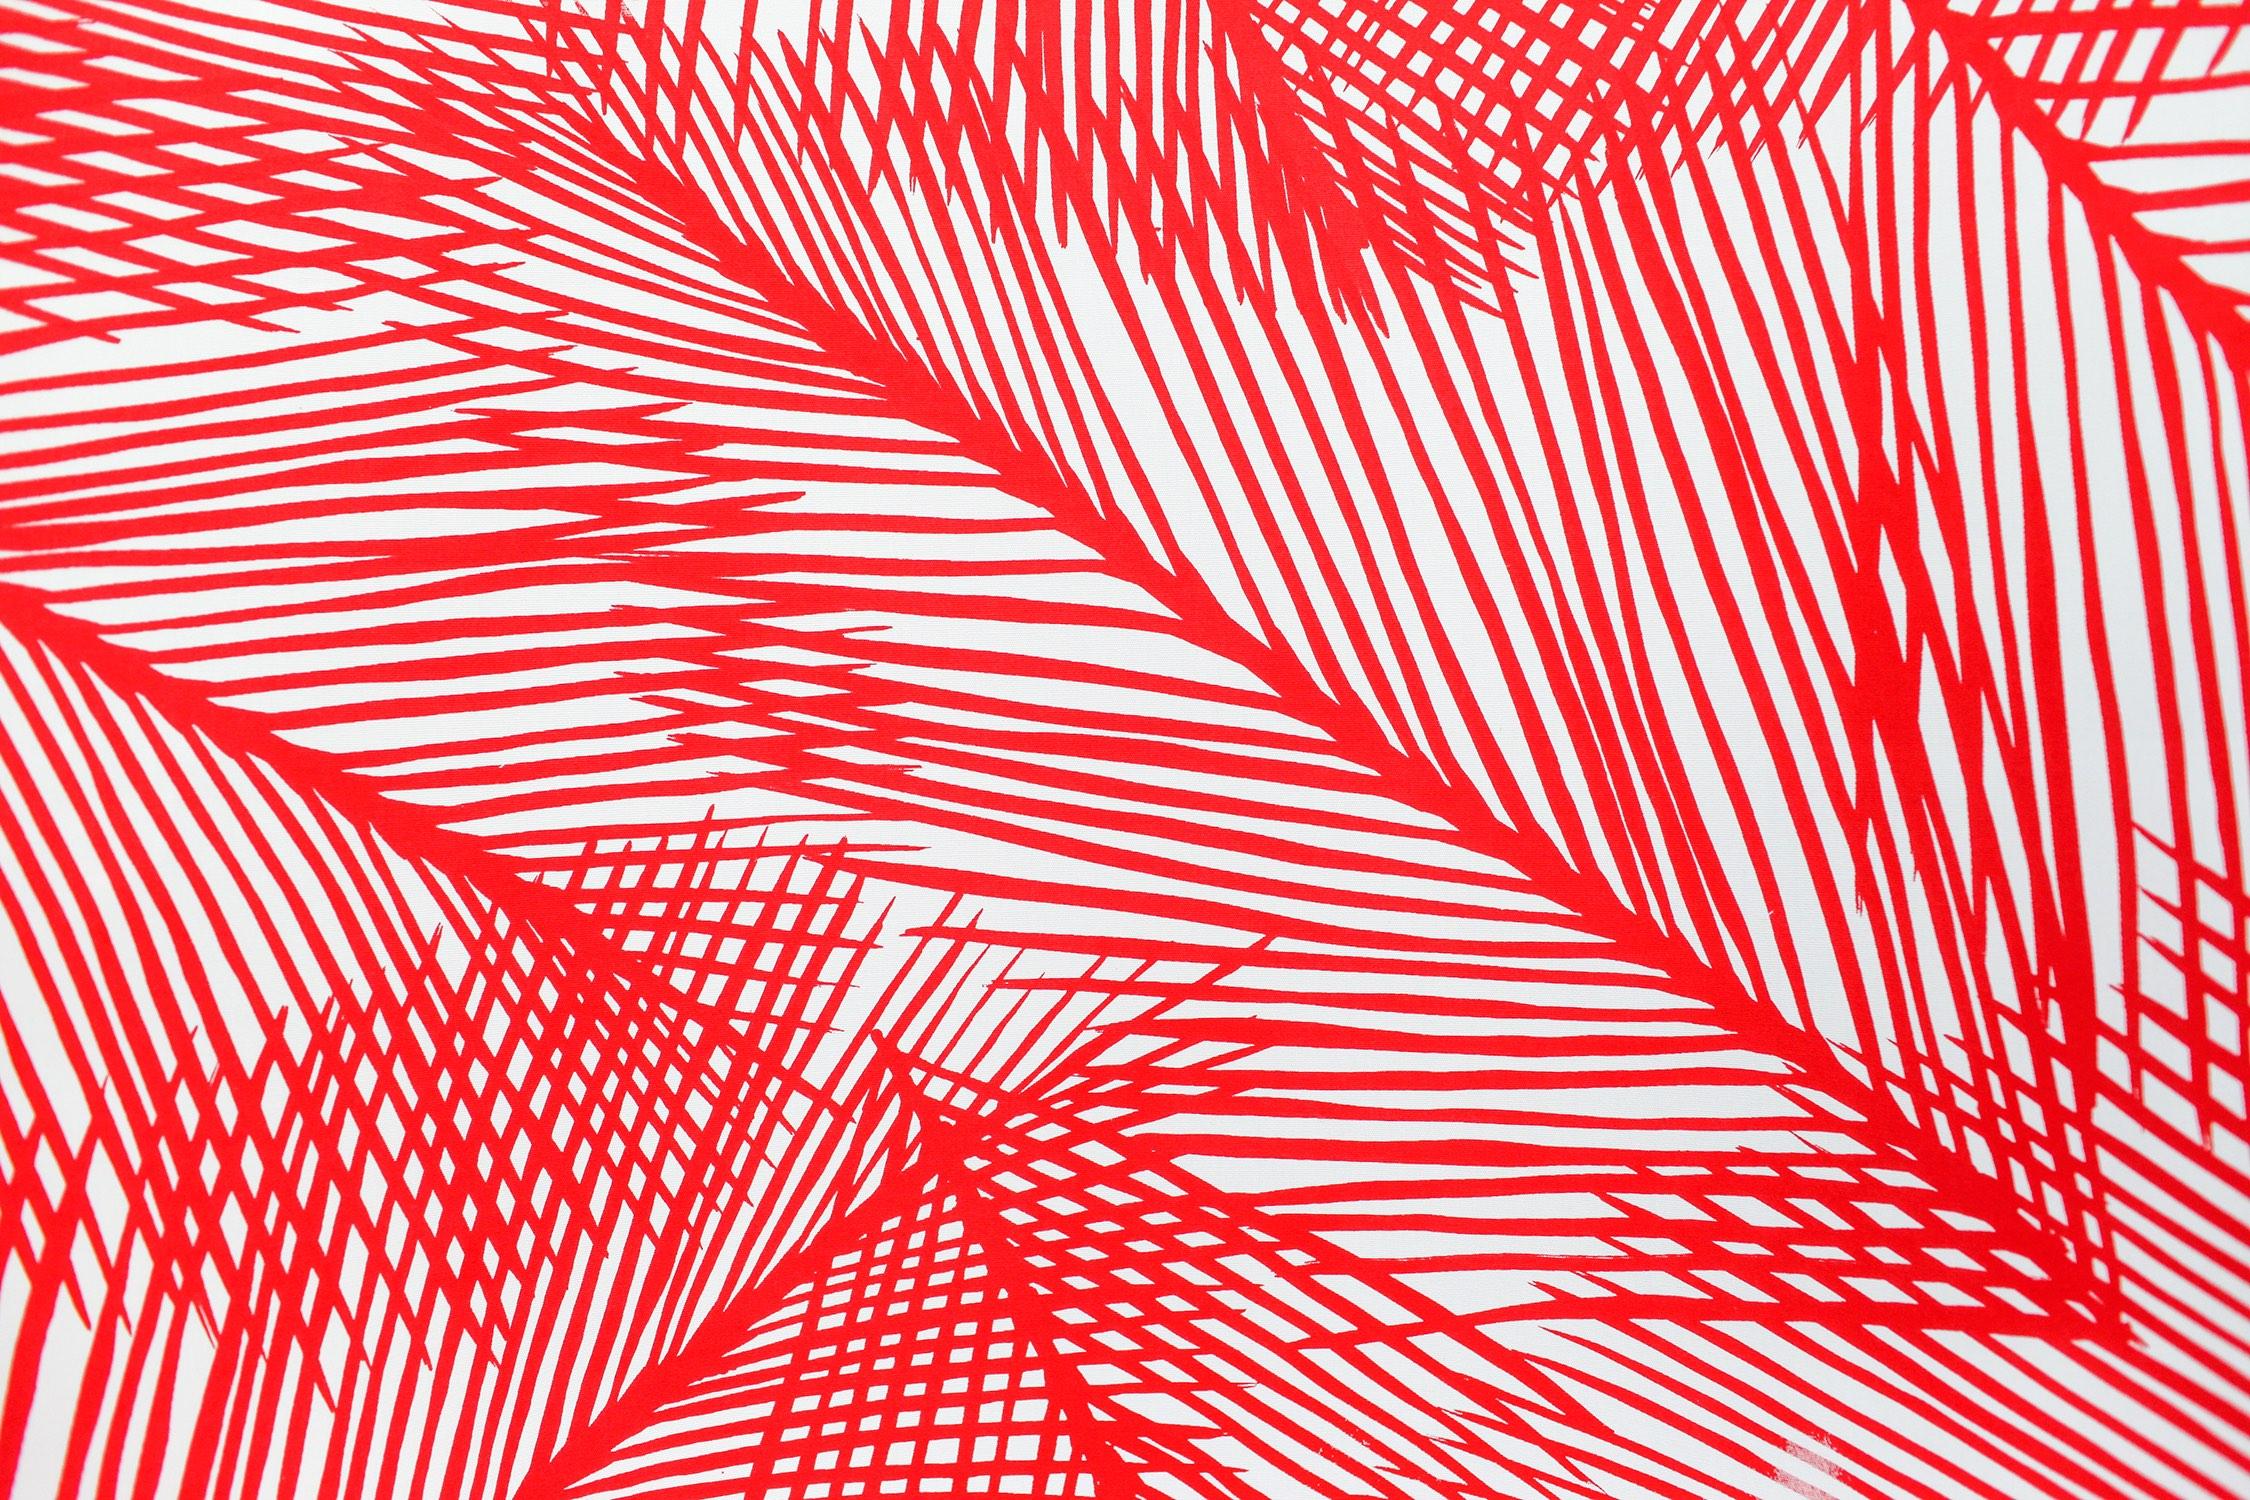 coconutshade-print-red-bahamahandprints-nassau-bahamas copy.jpg